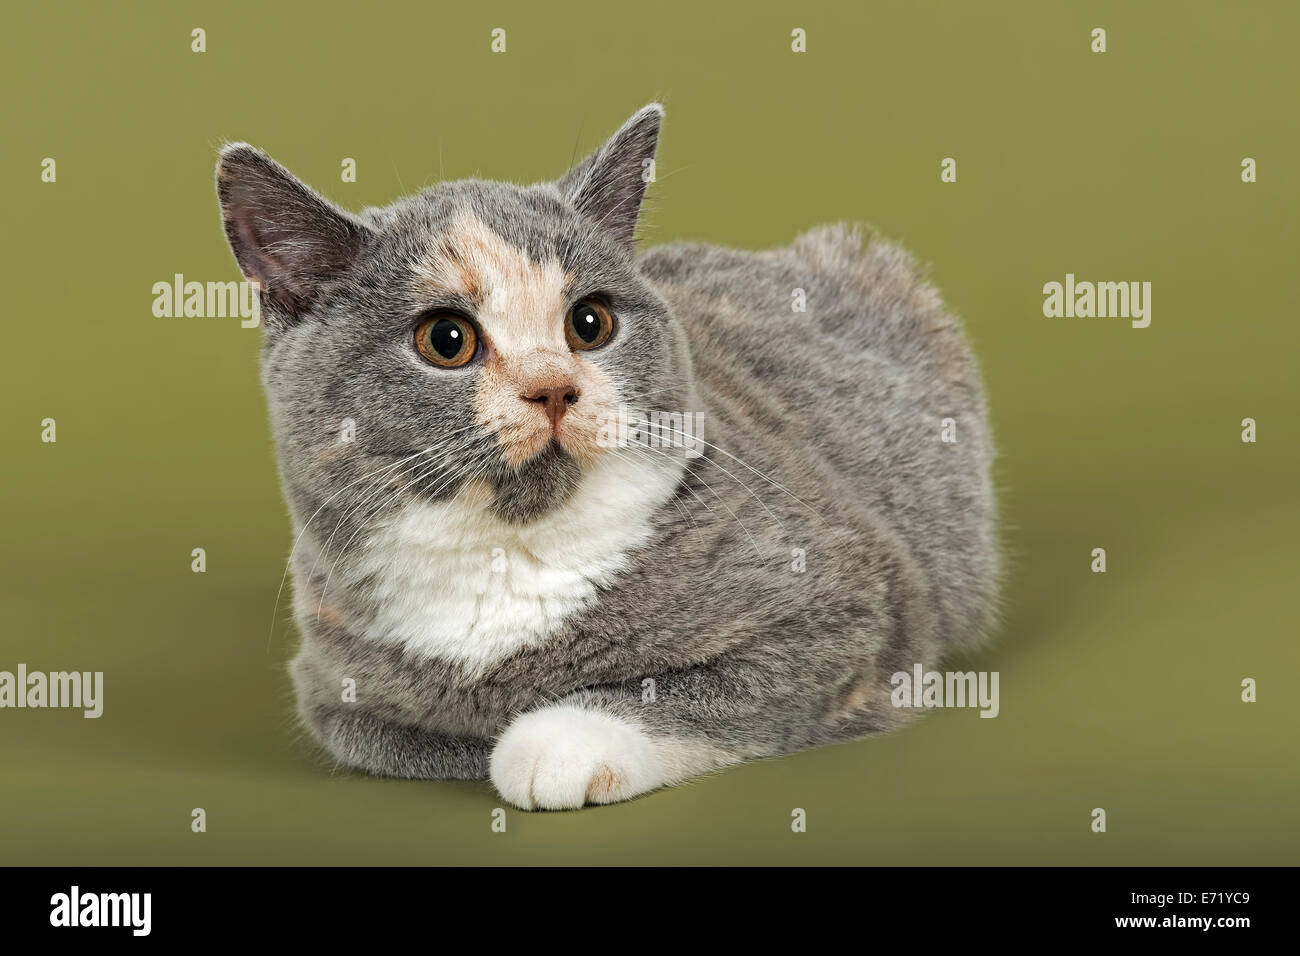 British Shorthair kitten 18 weeks blue cream and white fur